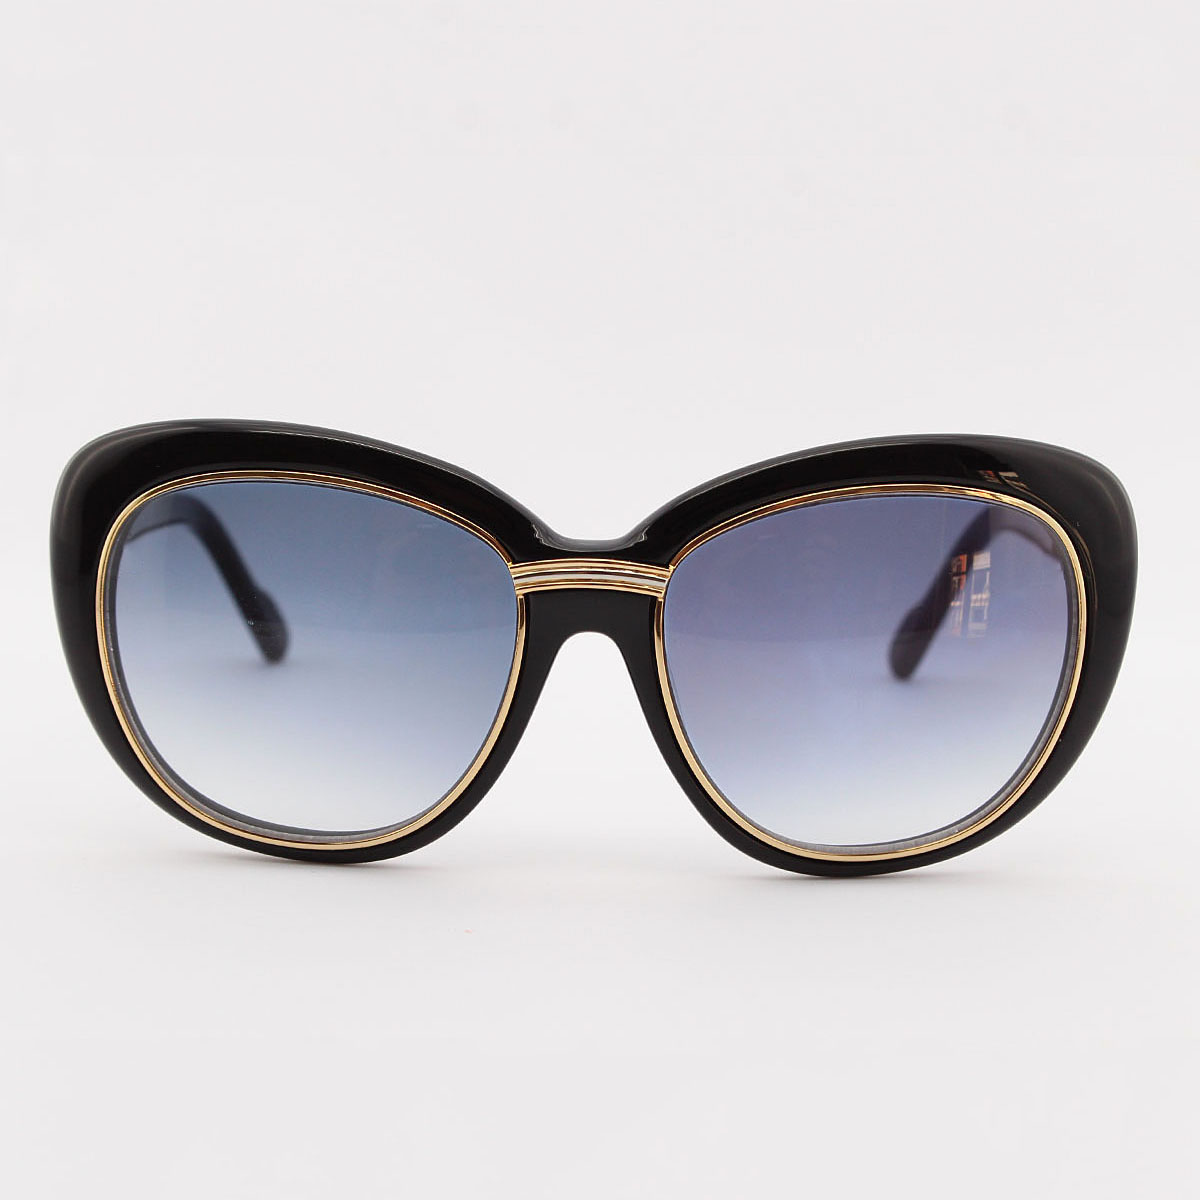 Vintage Women Sunglasses Cat Eye Sunglasses Ladie Eyewear Accessories Luxury Women's Clothing & Accessories shades for Ladies 11 women s classic cat eye sunglasses retro metal frame eyeglasses eyewear shades